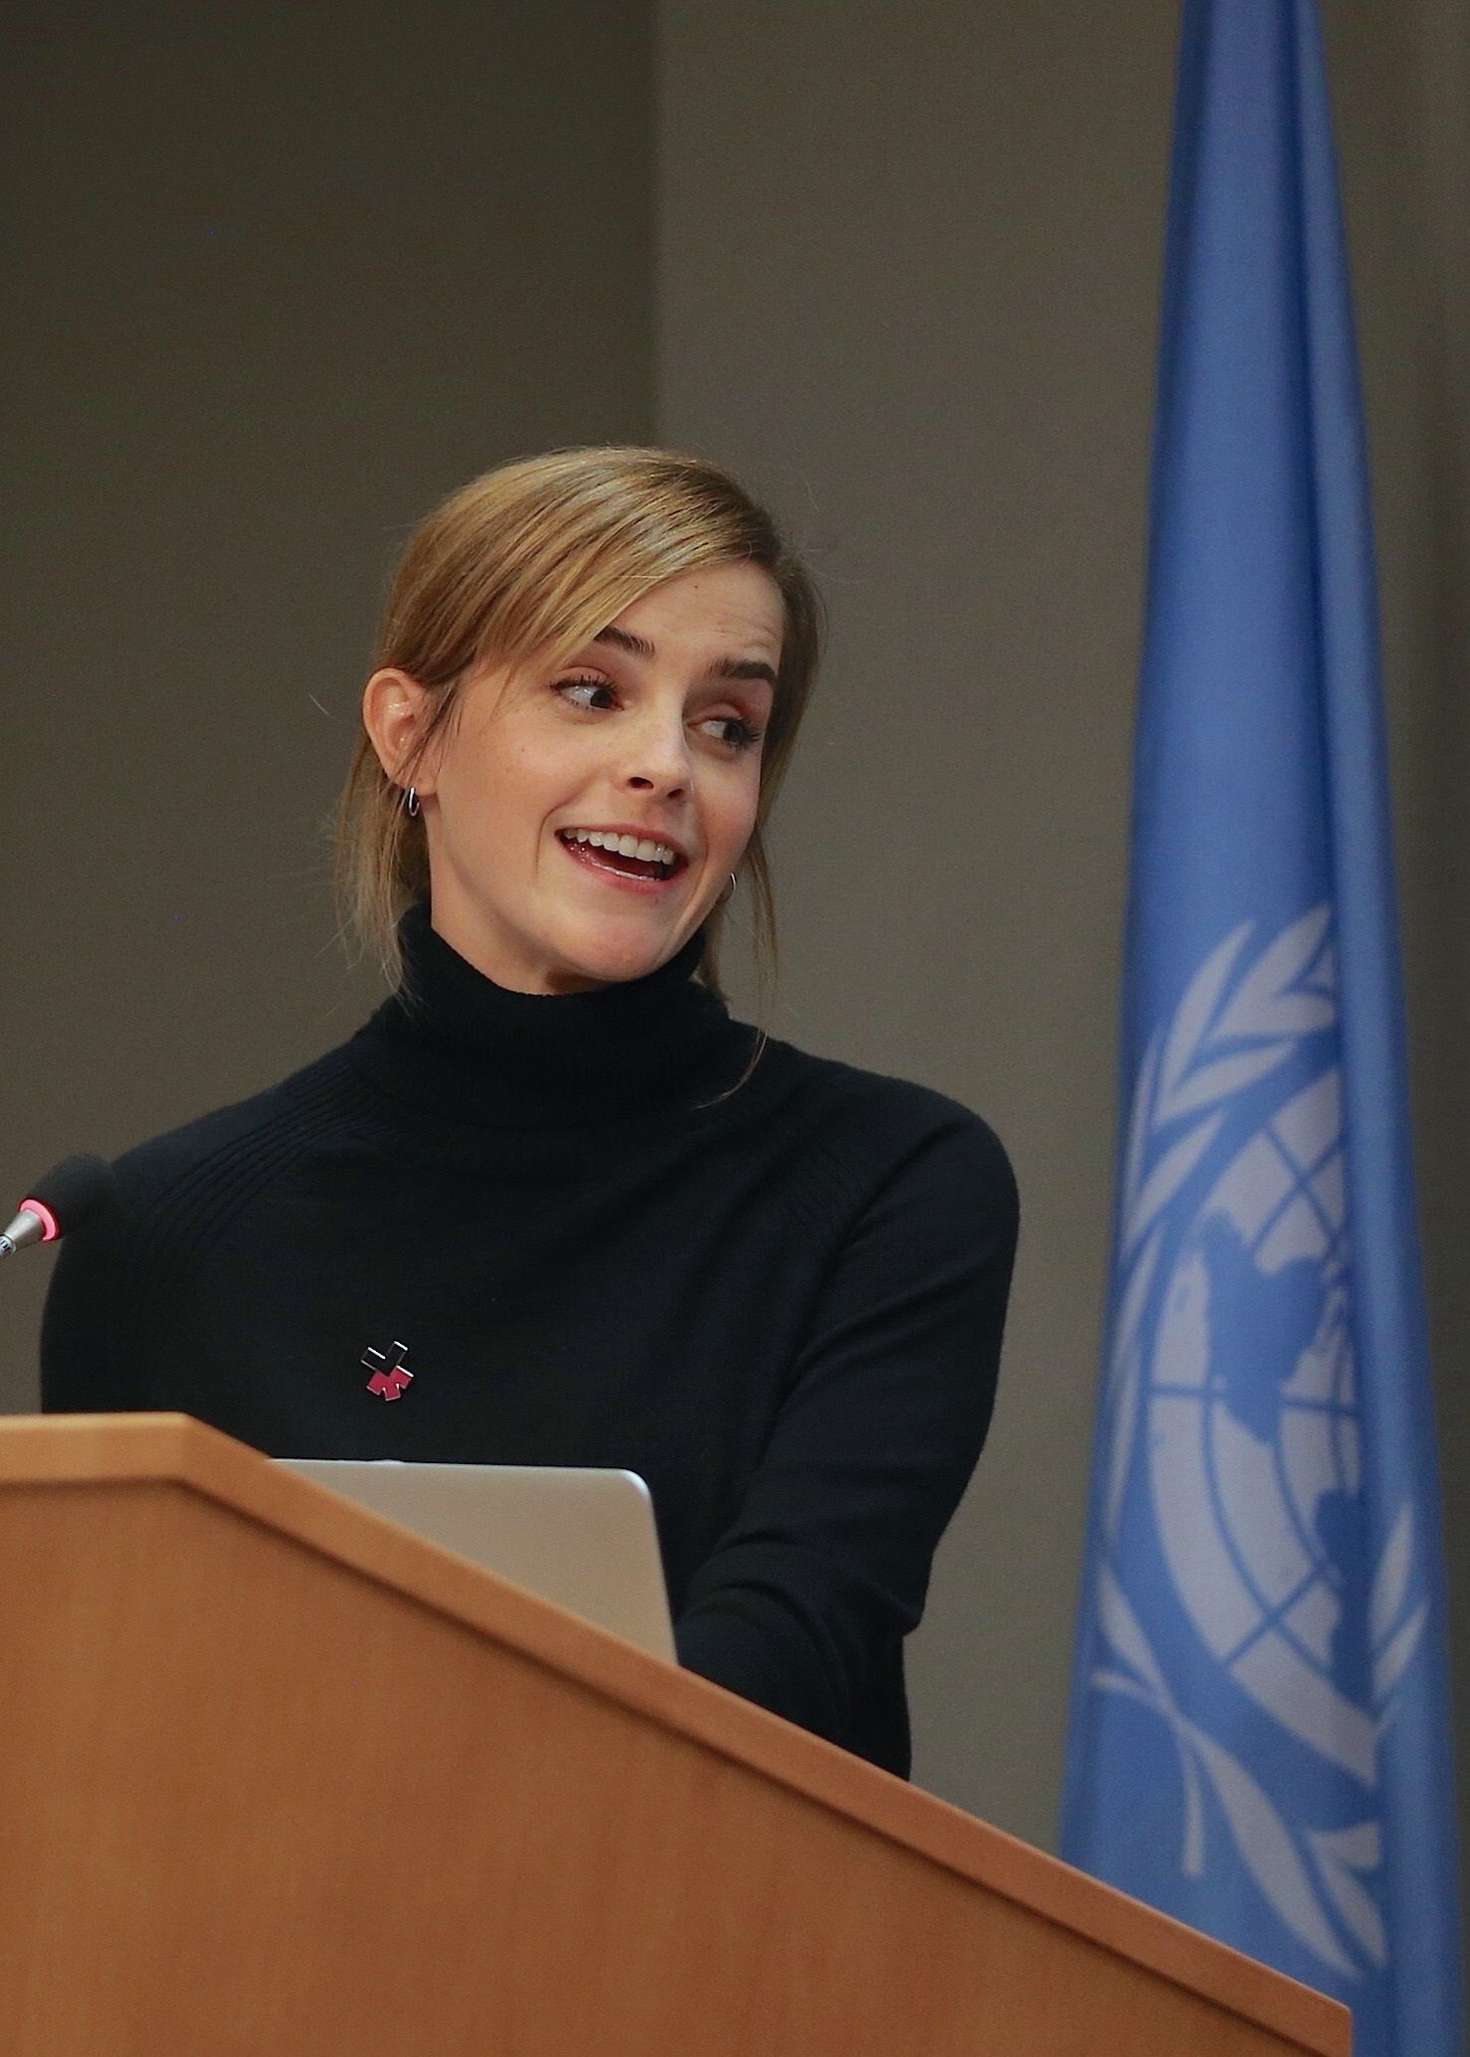 Emma Watson - 'HeForShe Impact' Celebrity Champion in New York